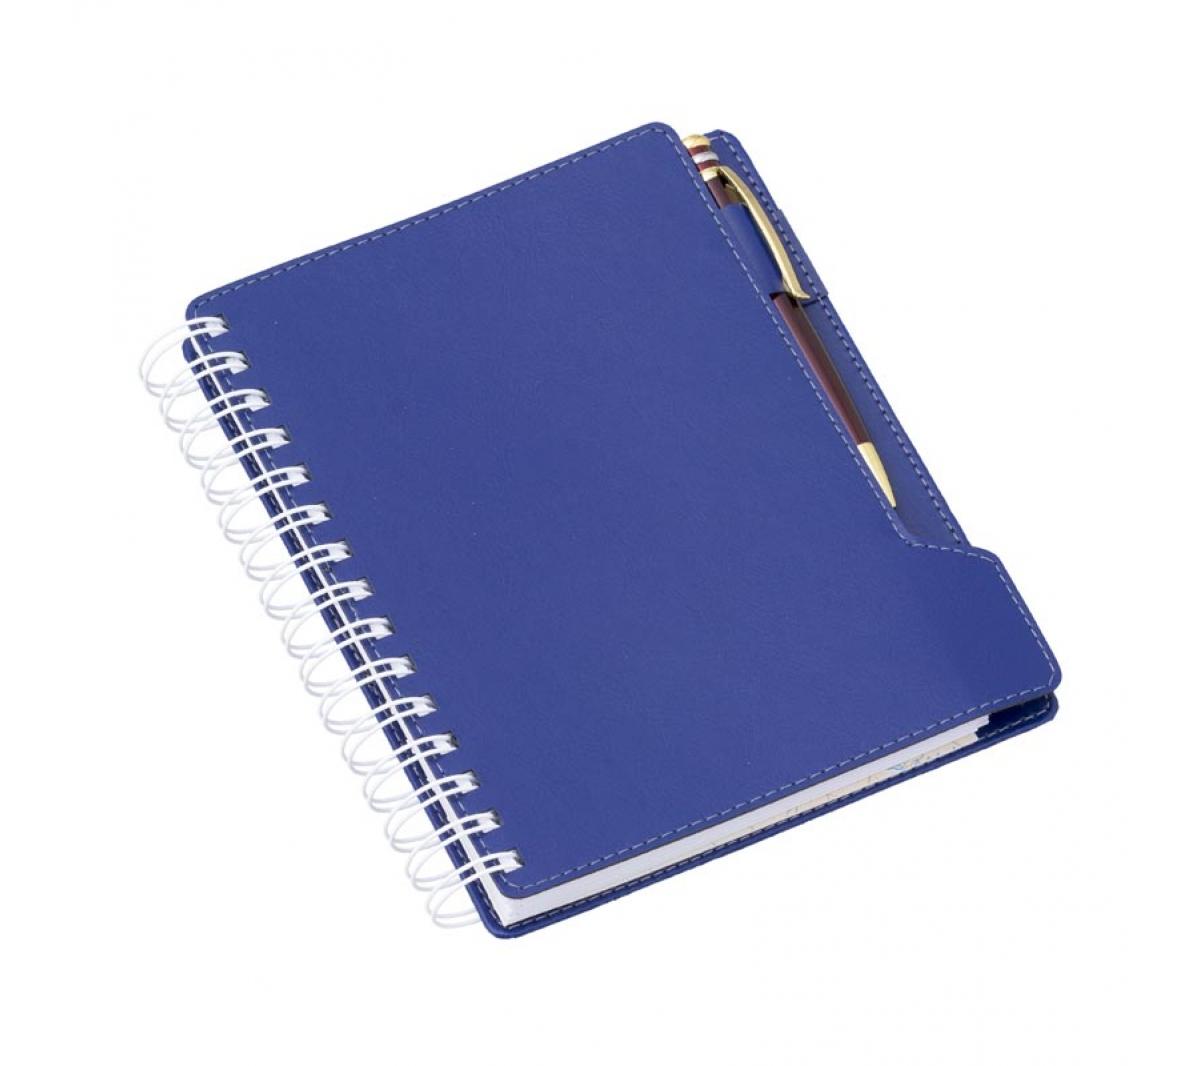 febaf26ec Brinde agenda personalizada - Flic Brindes